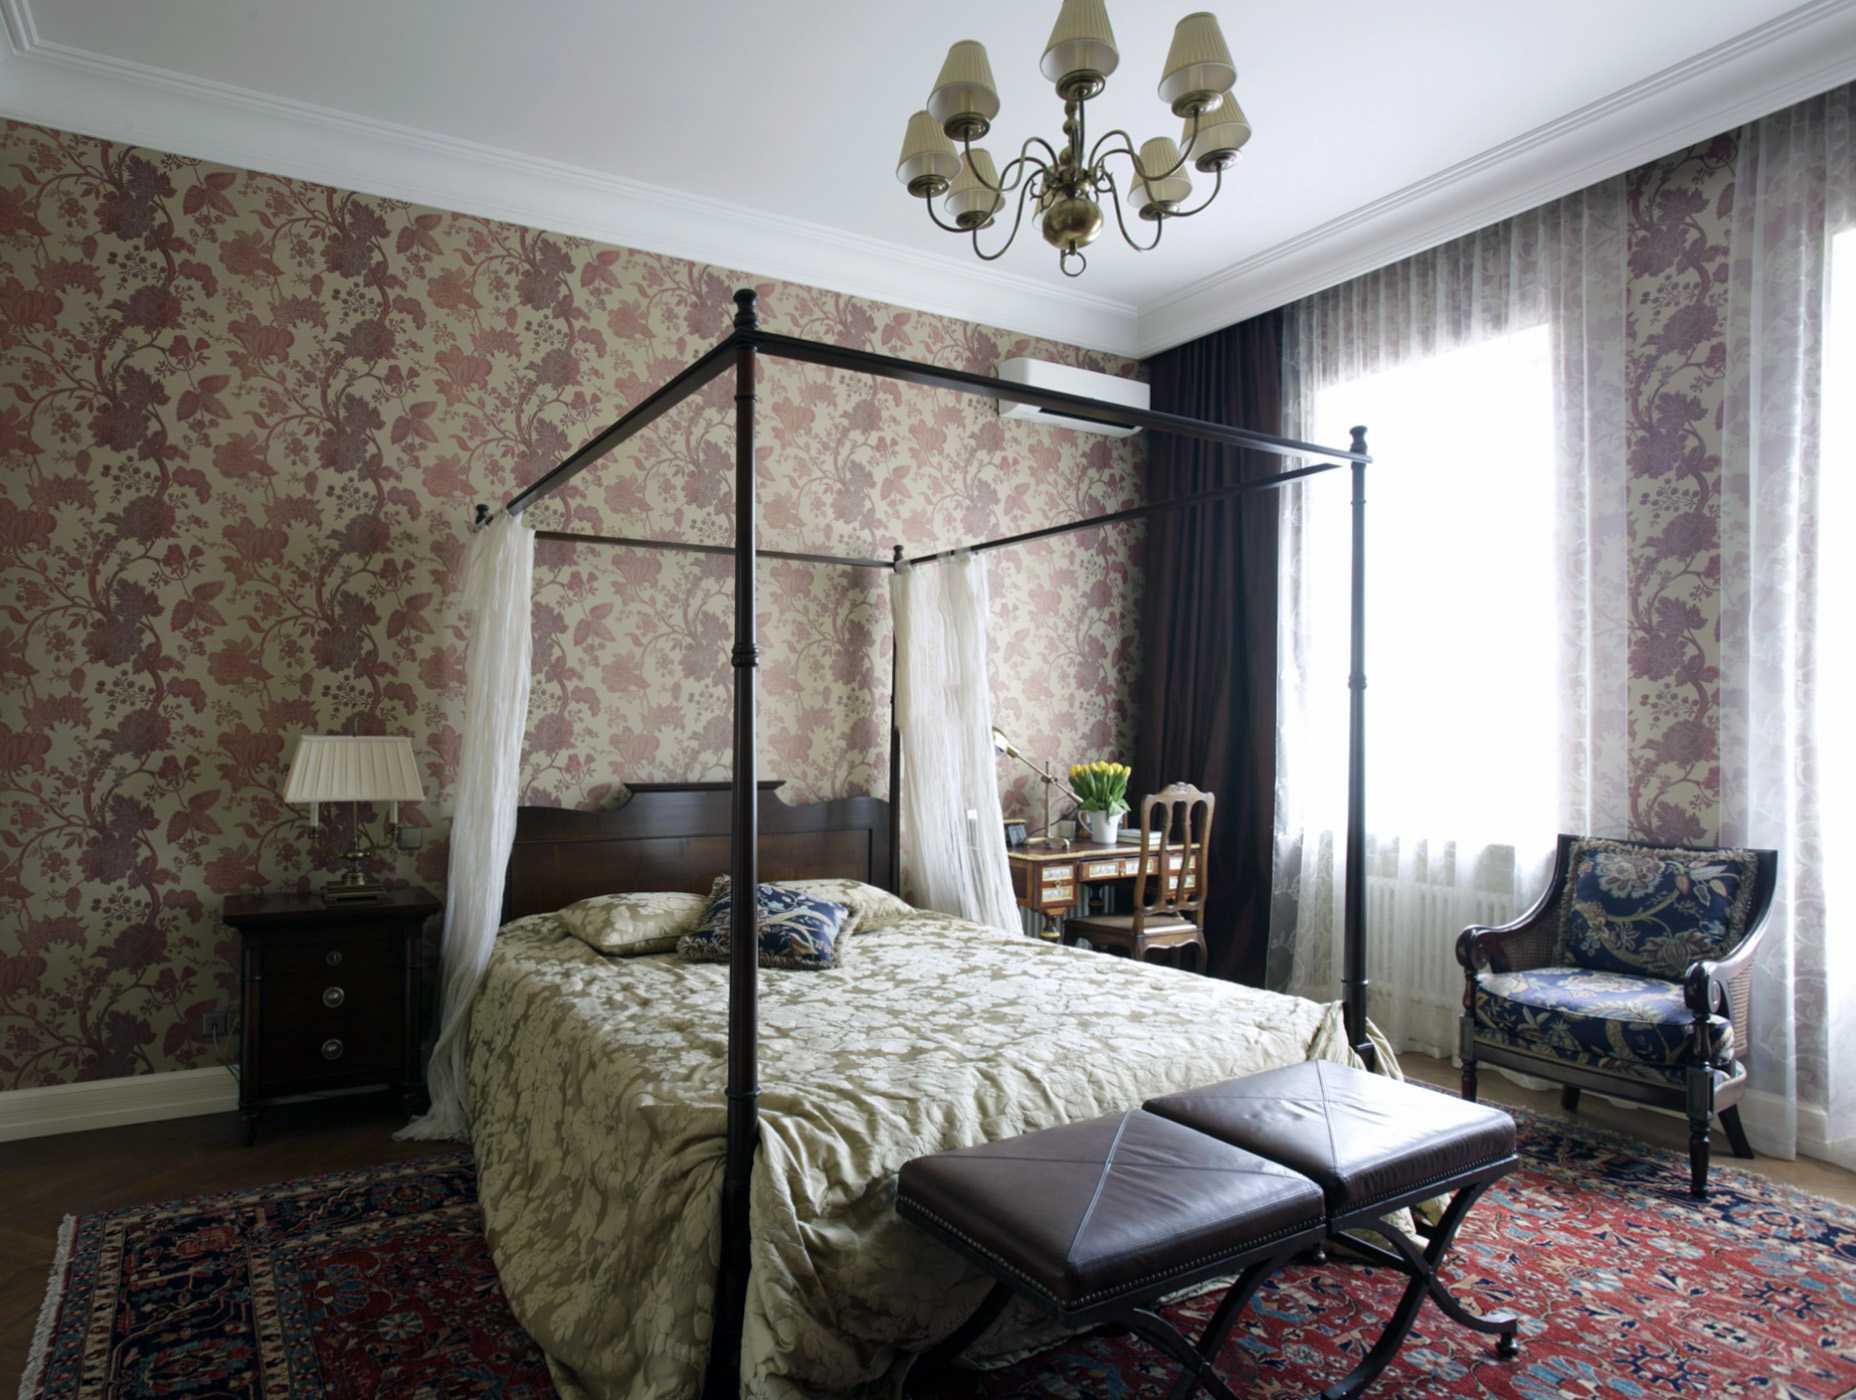 neparasts Viktorijas laikmeta stila viesistabas interjers